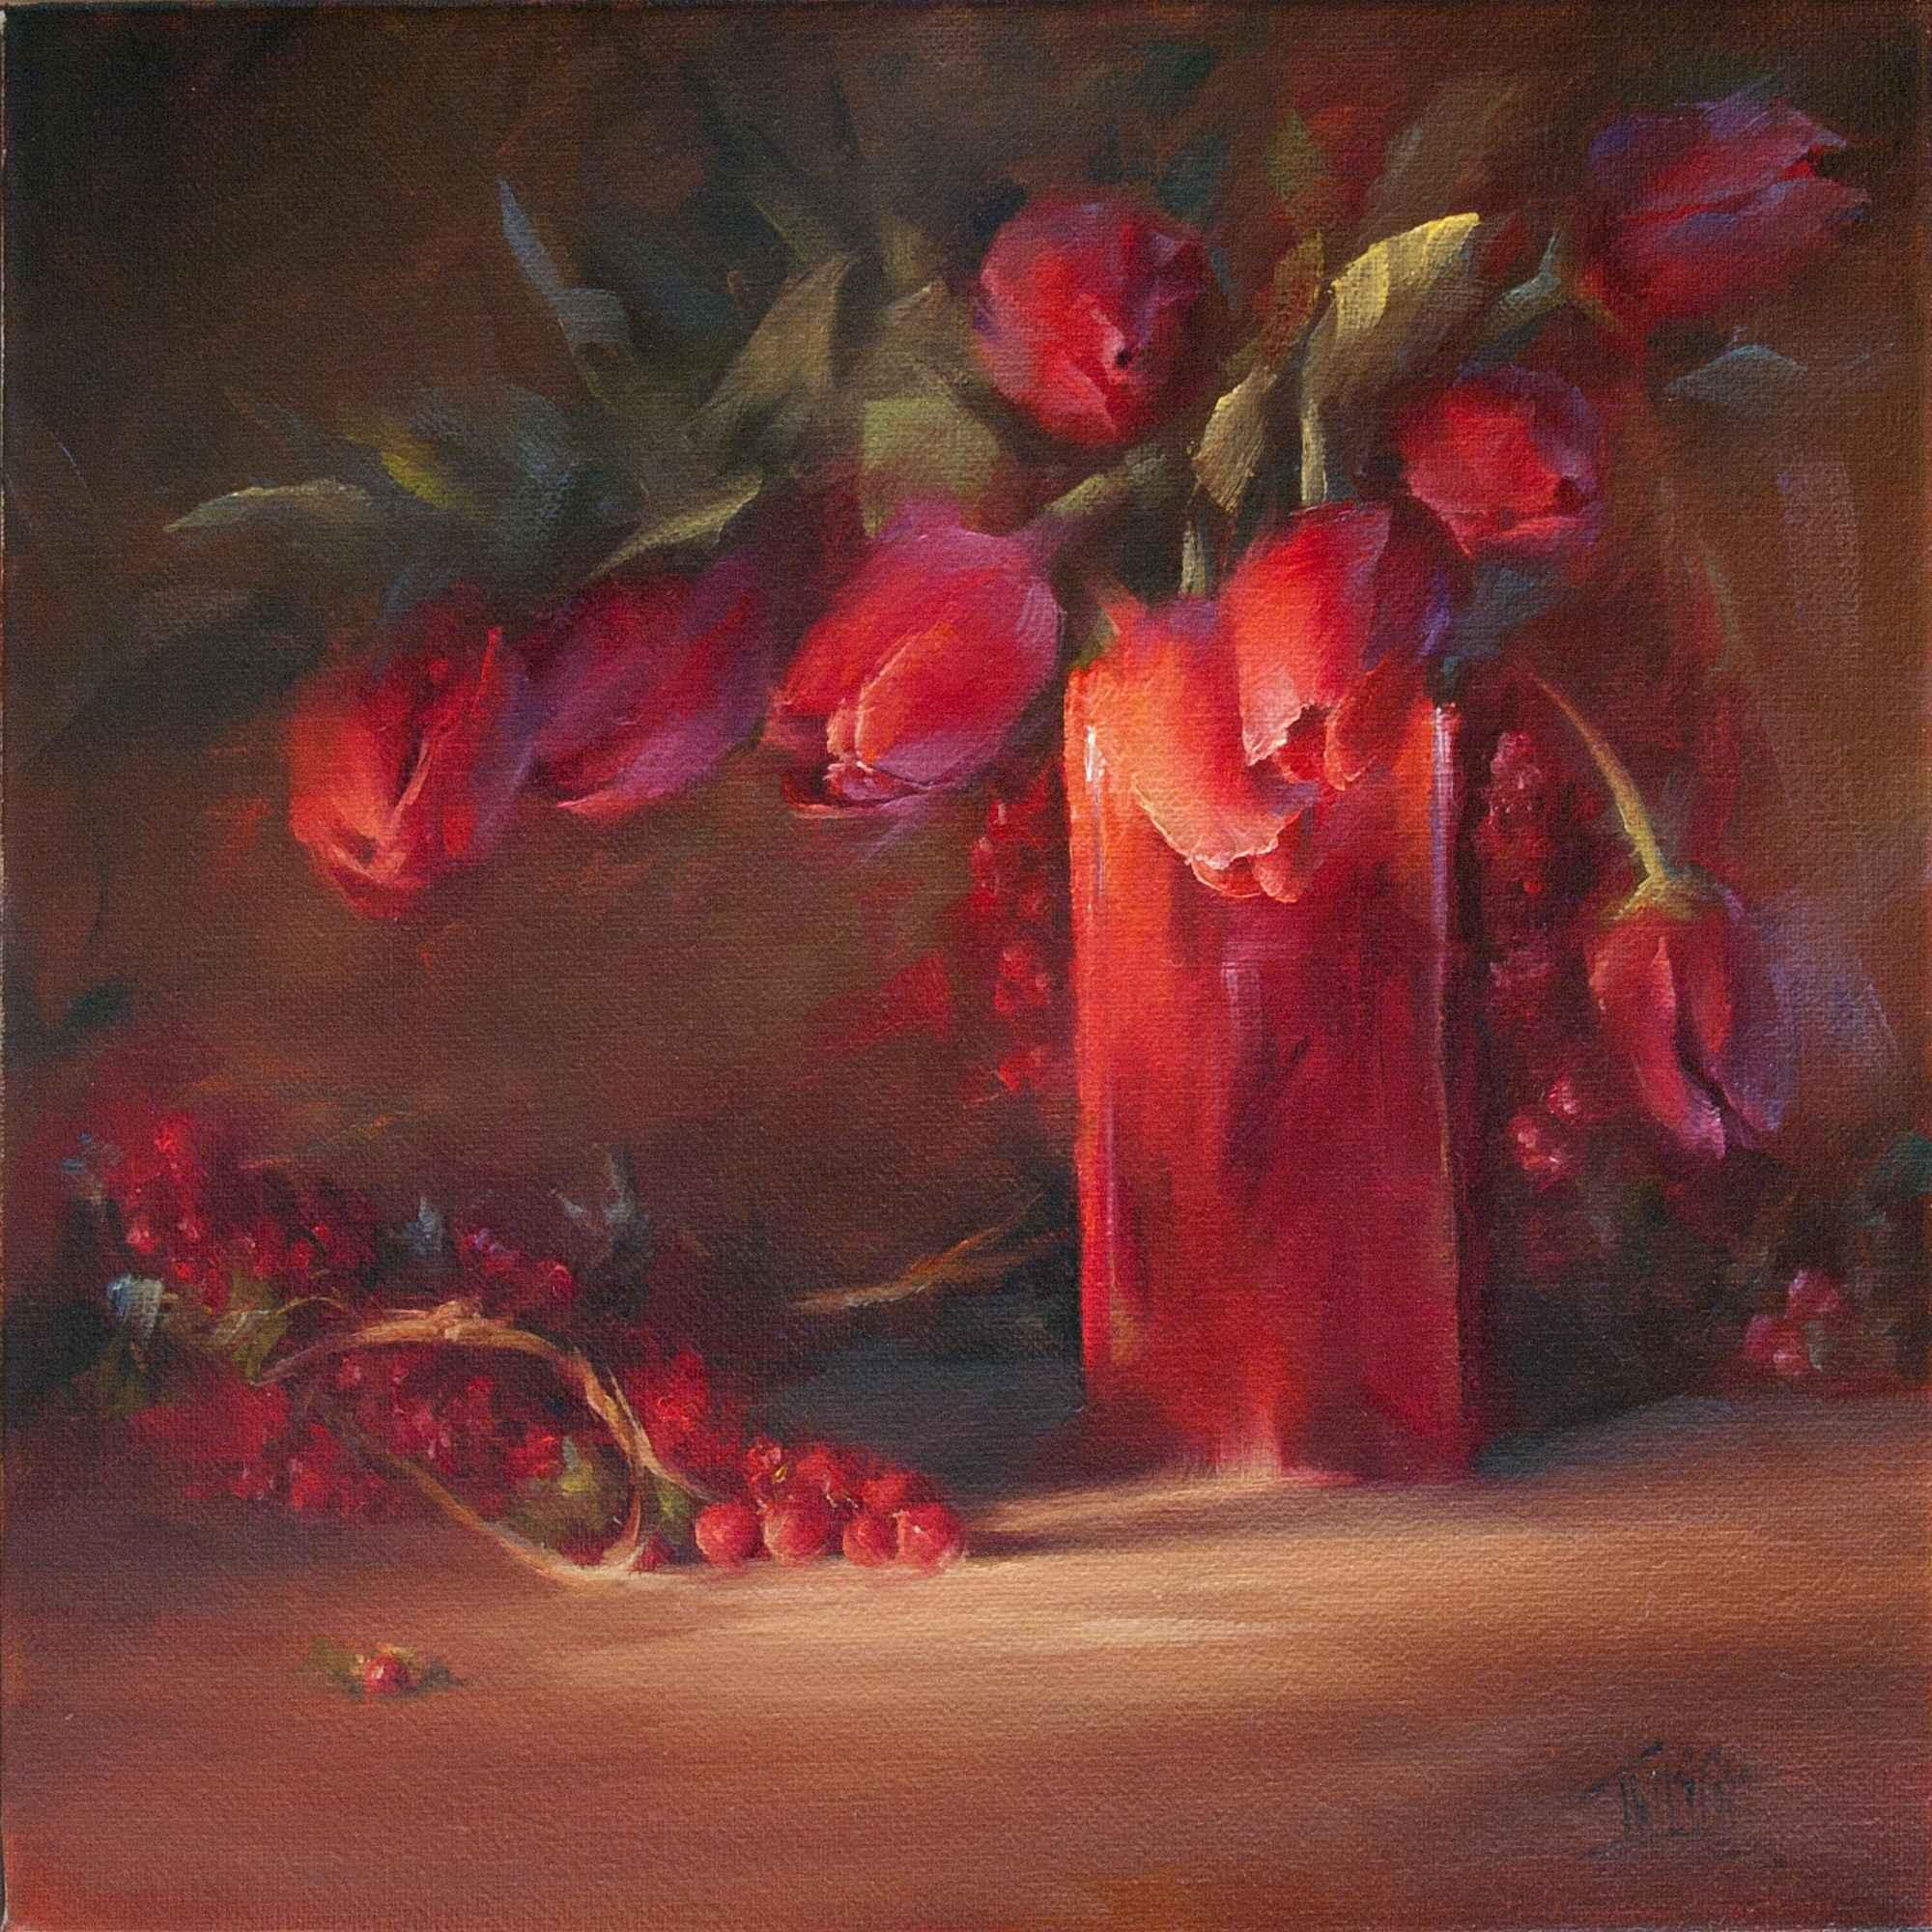 Finish Line by  Lori Twiggs - Masterpiece Online